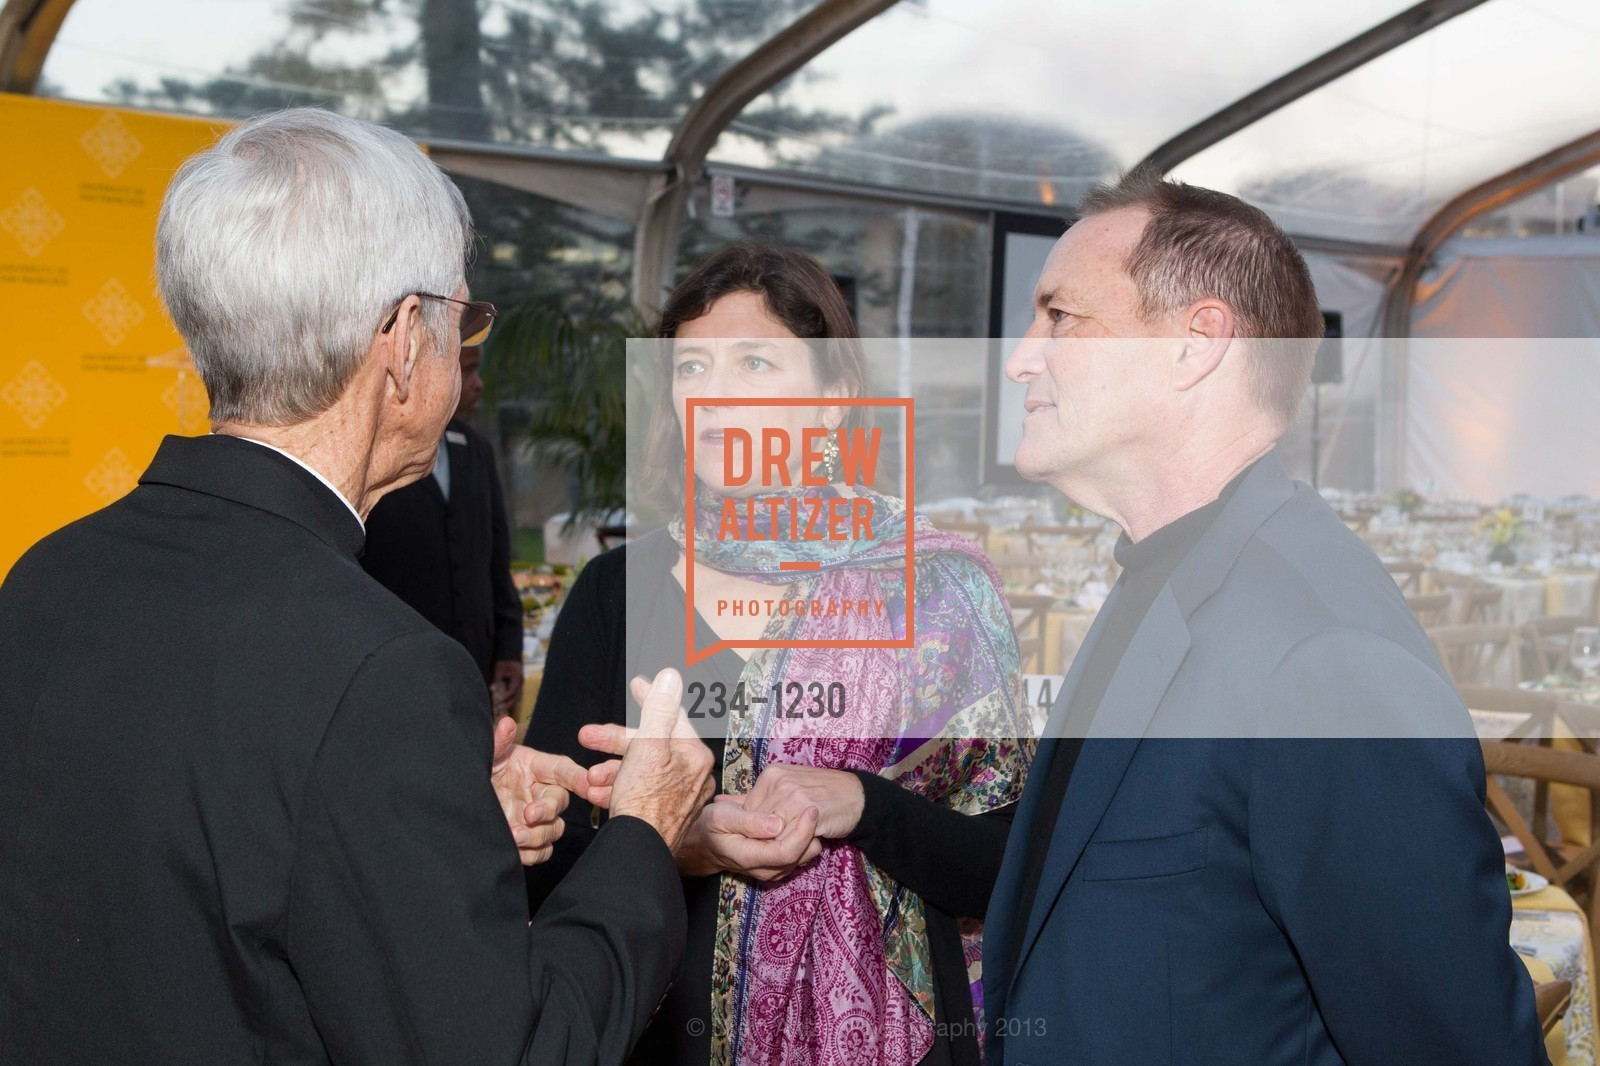 Stephen Privett, Tricia Gibbs, Richard Gibbs, Photo #234-1230